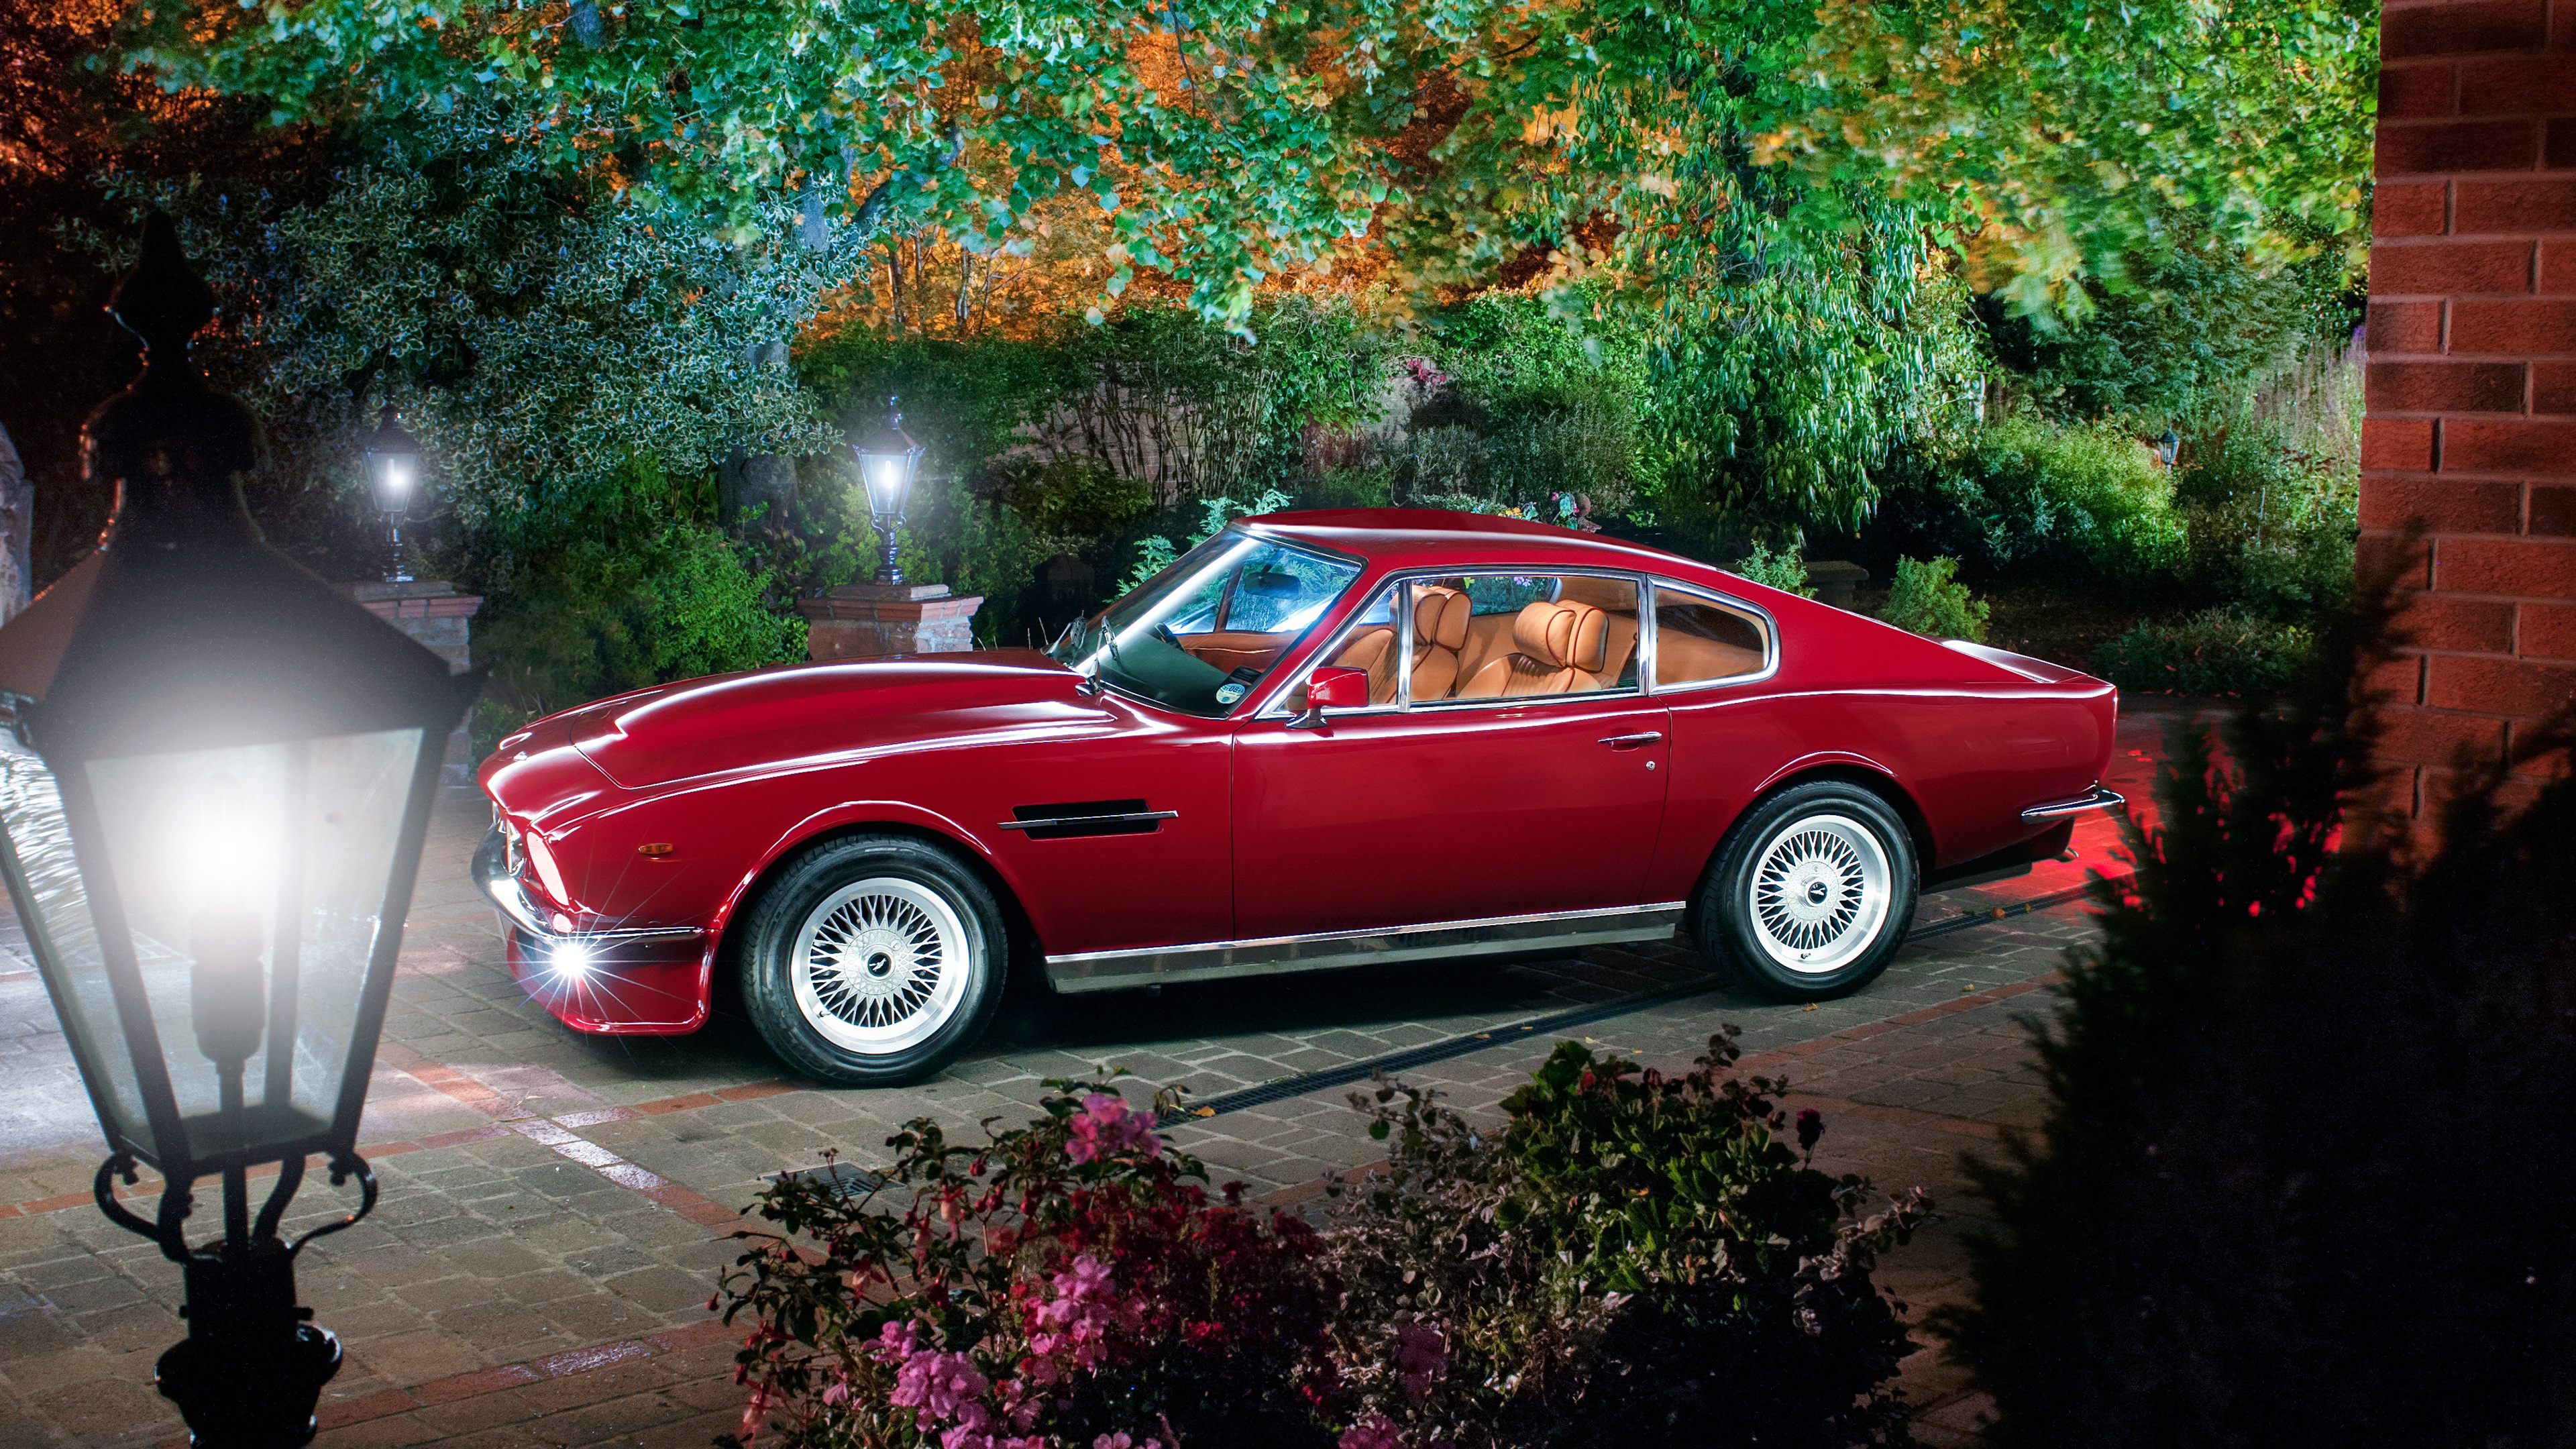 aston martin retro car 1539108927 - Aston Martin Retro Car - vintage wallpapers, retro wallpapers, hd-wallpapers, cars wallpapers, aston martin wallpapers, 4k-wallpapers